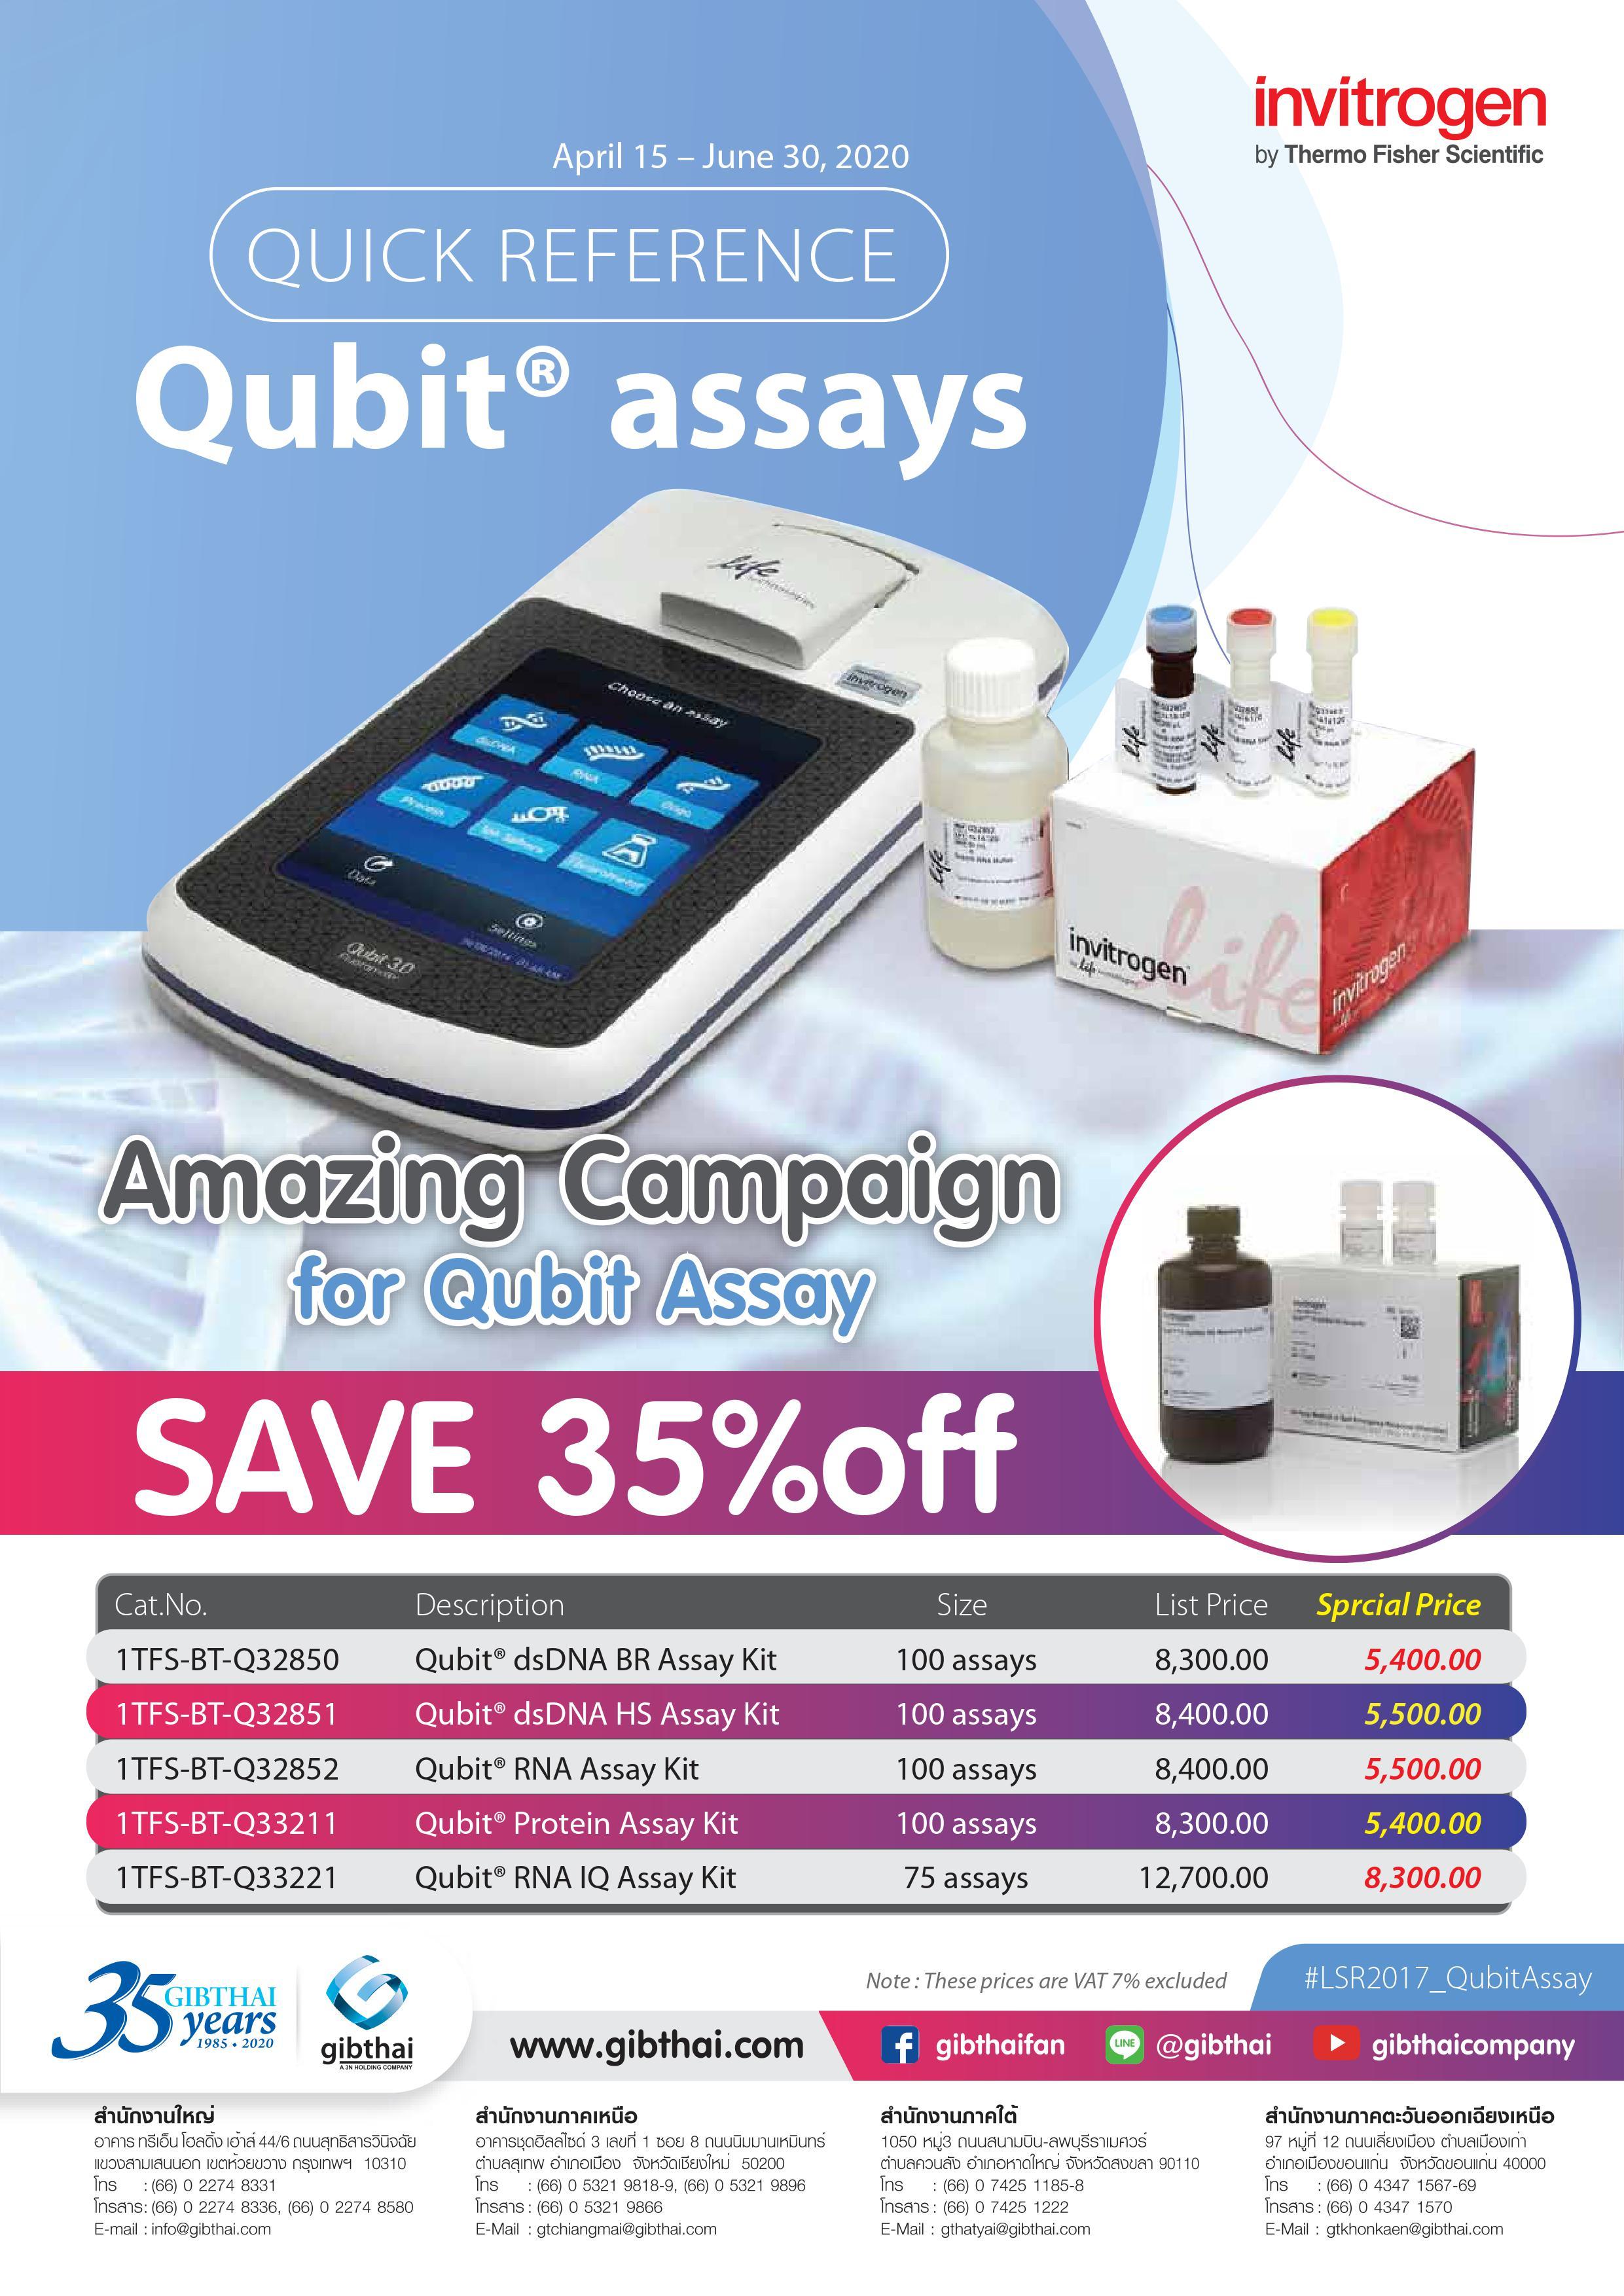 Qubit Assay